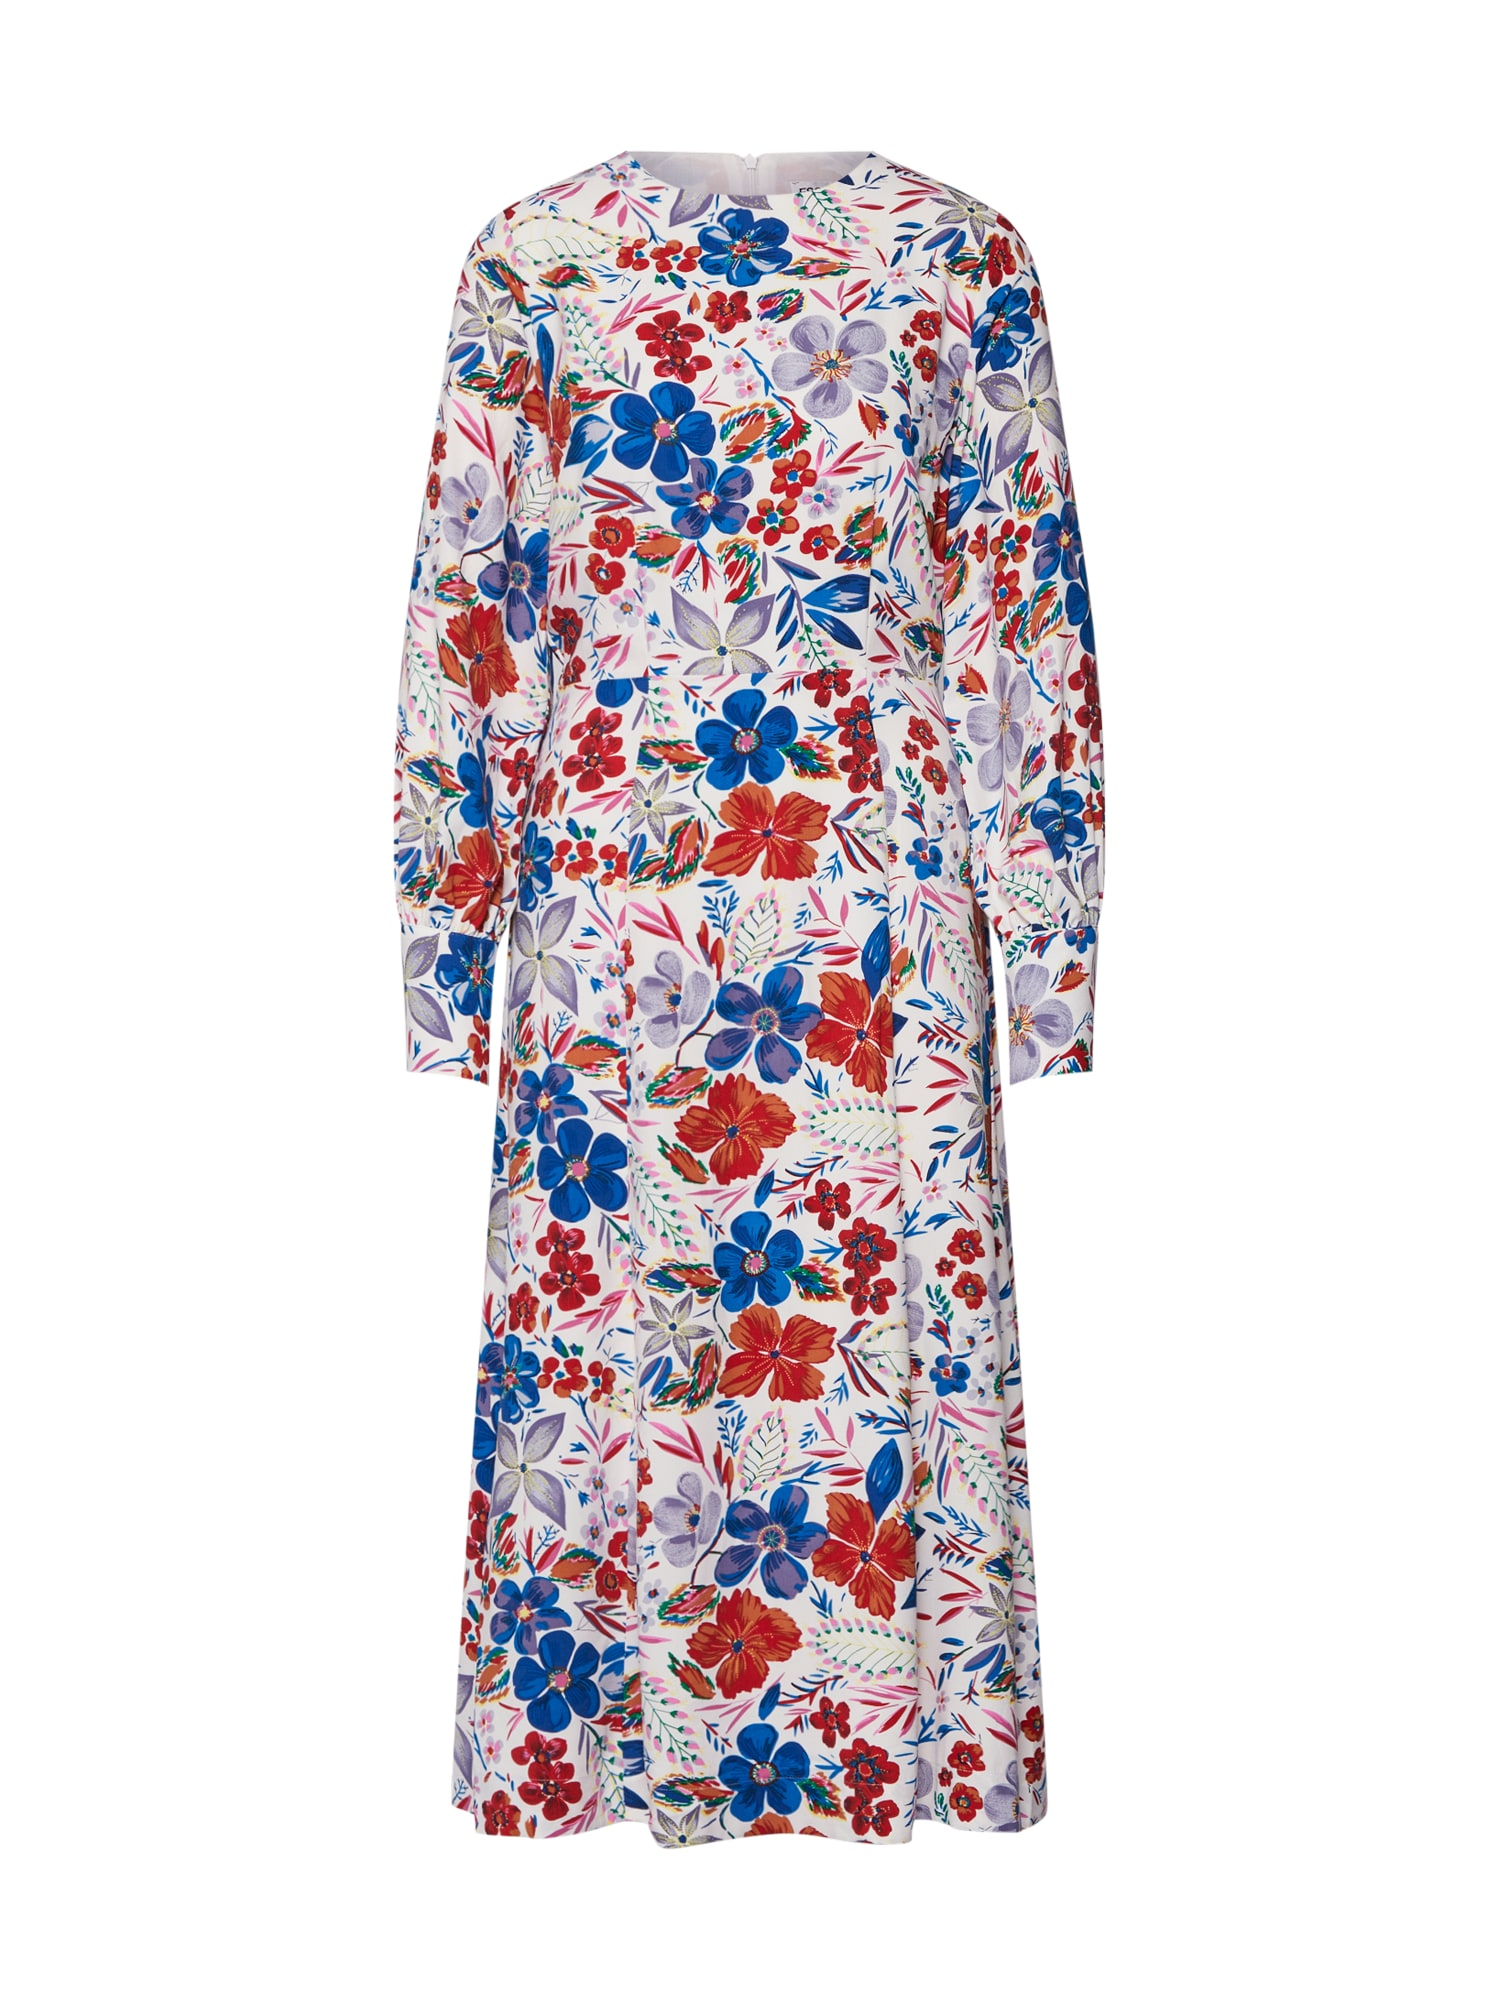 Šaty Saga long sleeved dress mix barev bílá Essentiel Antwerp